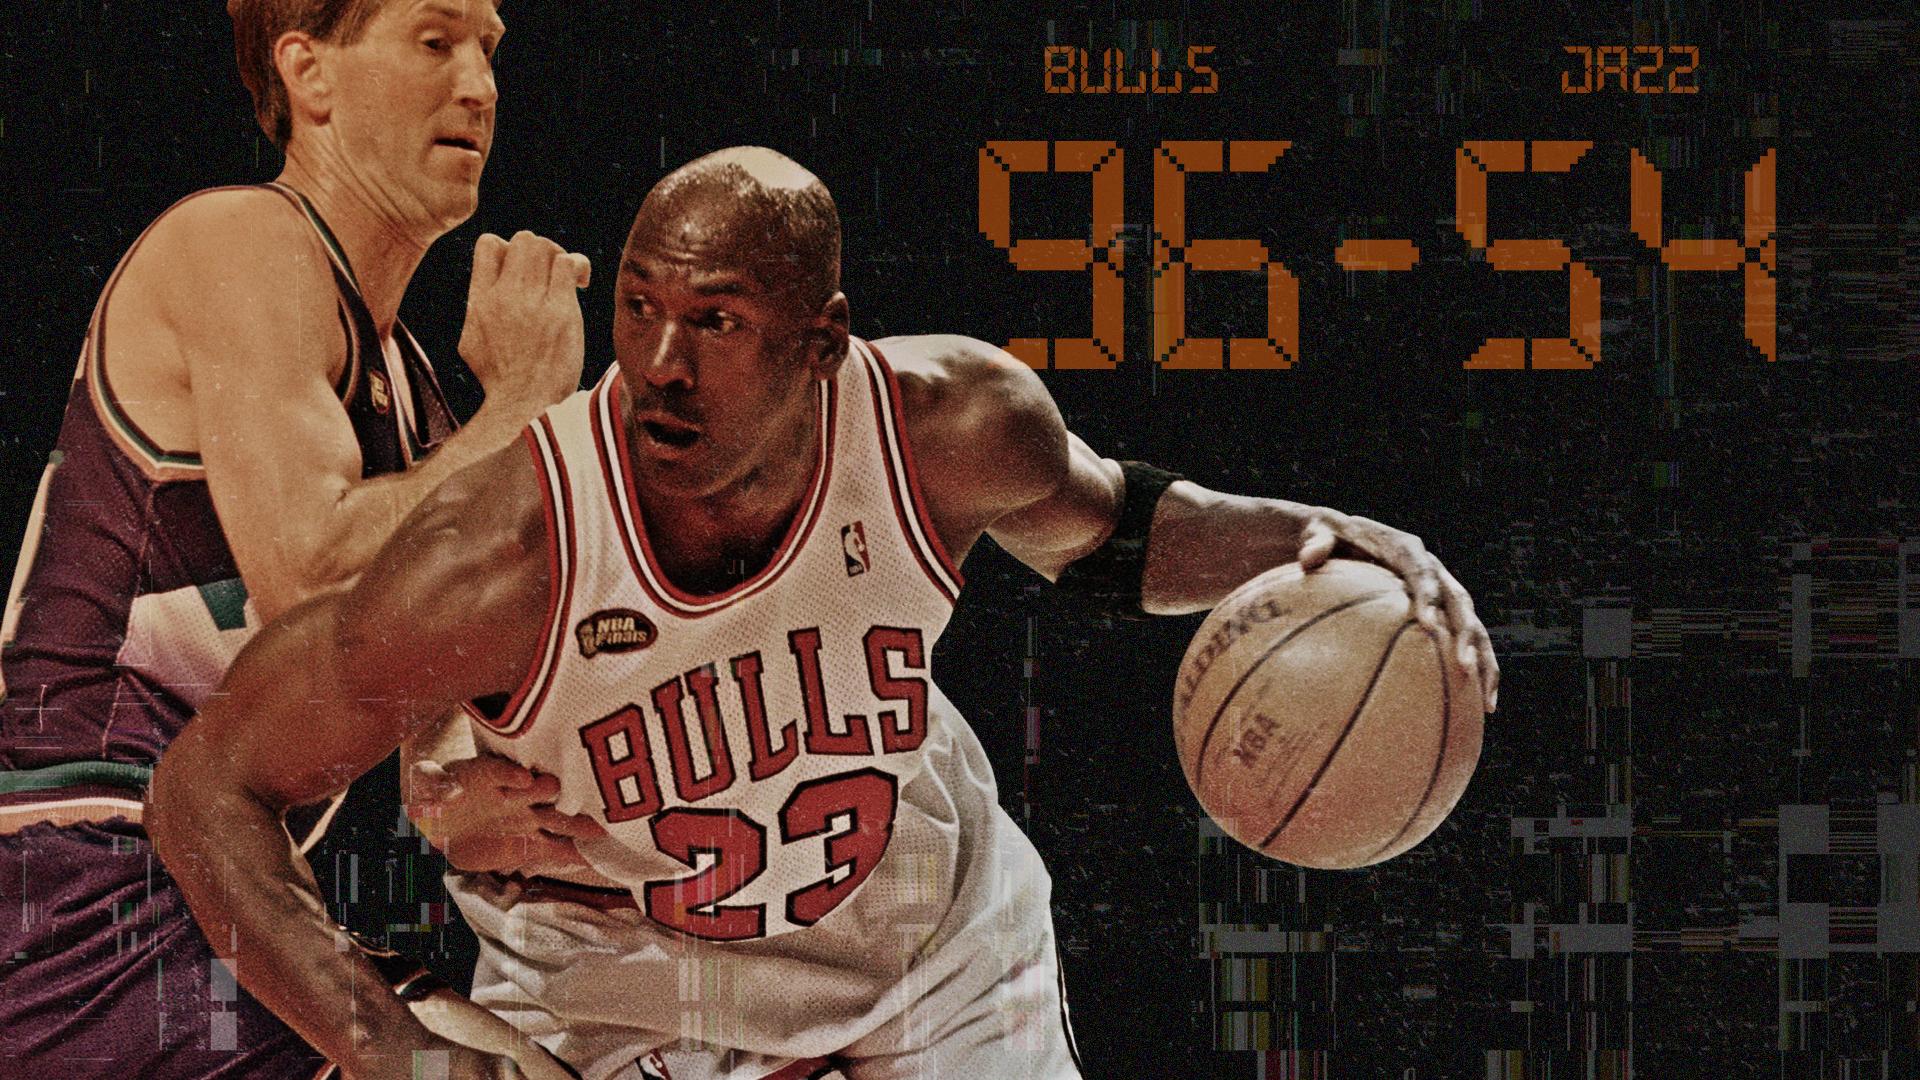 e7ad8bec729d98 Remembering when Michael Jordan